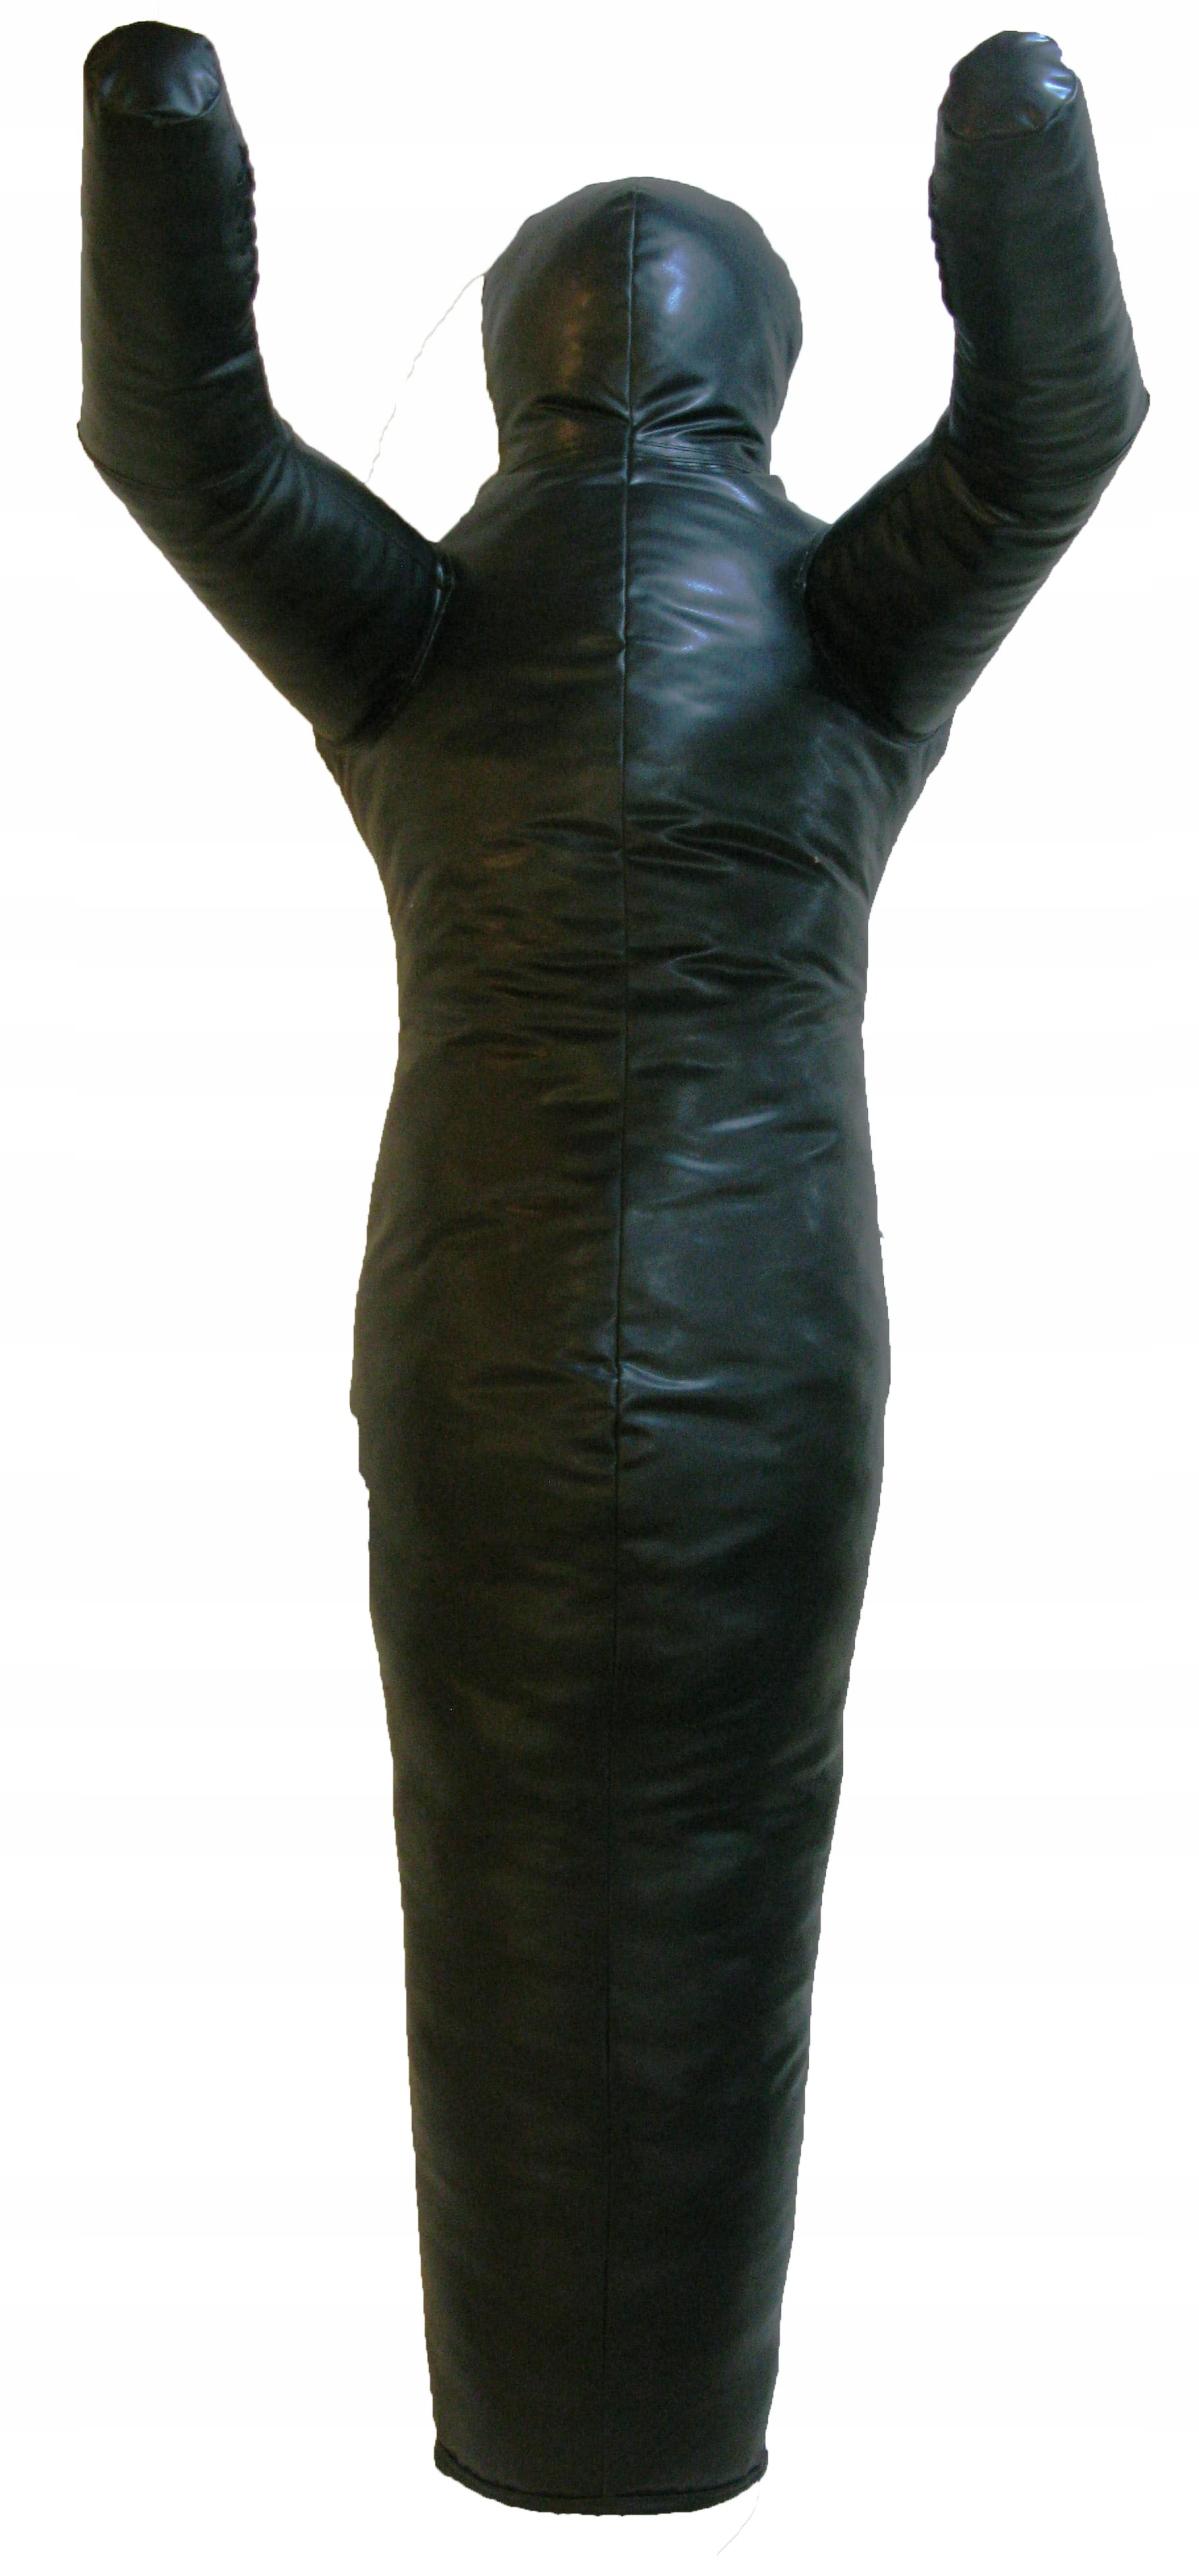 Manekin Wr. 165 cm / 40kg s PVC